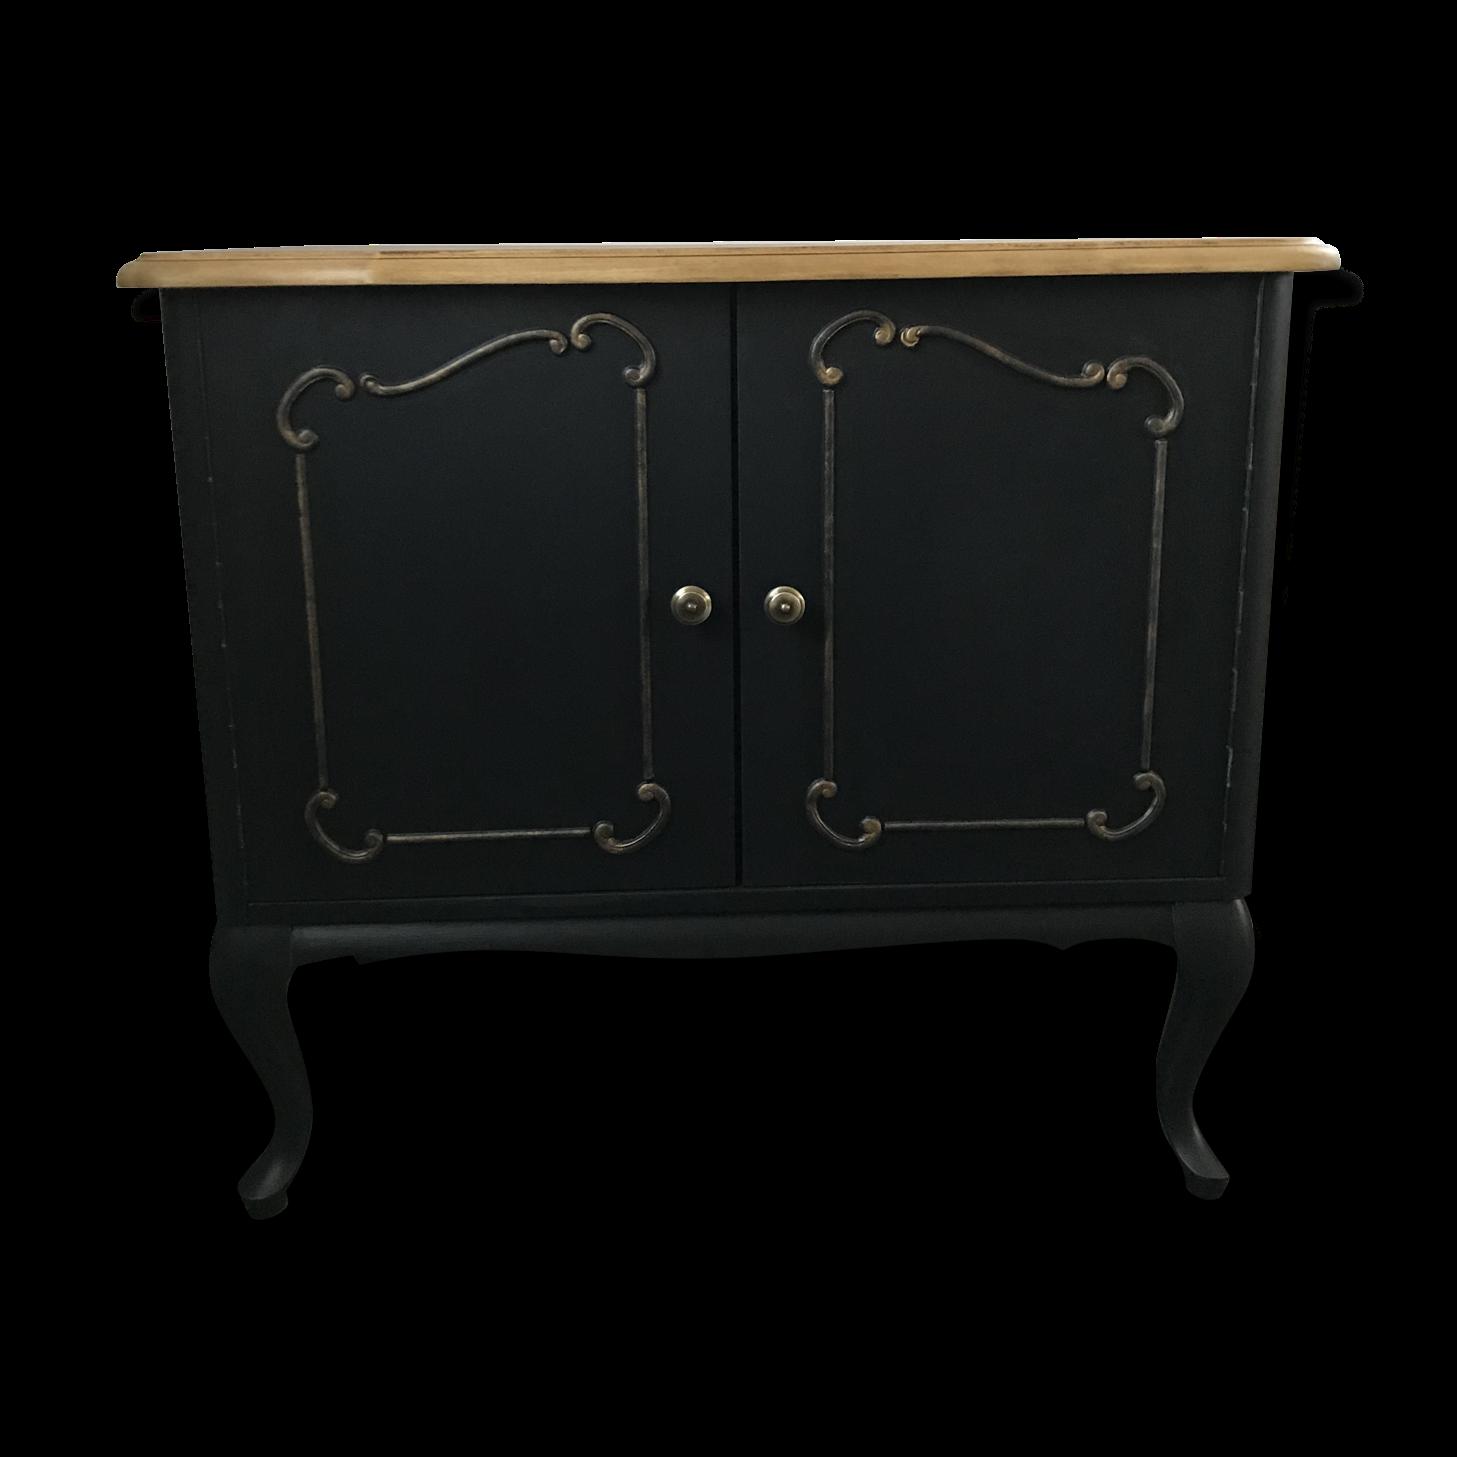 commode ancienne relooke commode ancienne relooker commodes romantique relooker une armoire. Black Bedroom Furniture Sets. Home Design Ideas